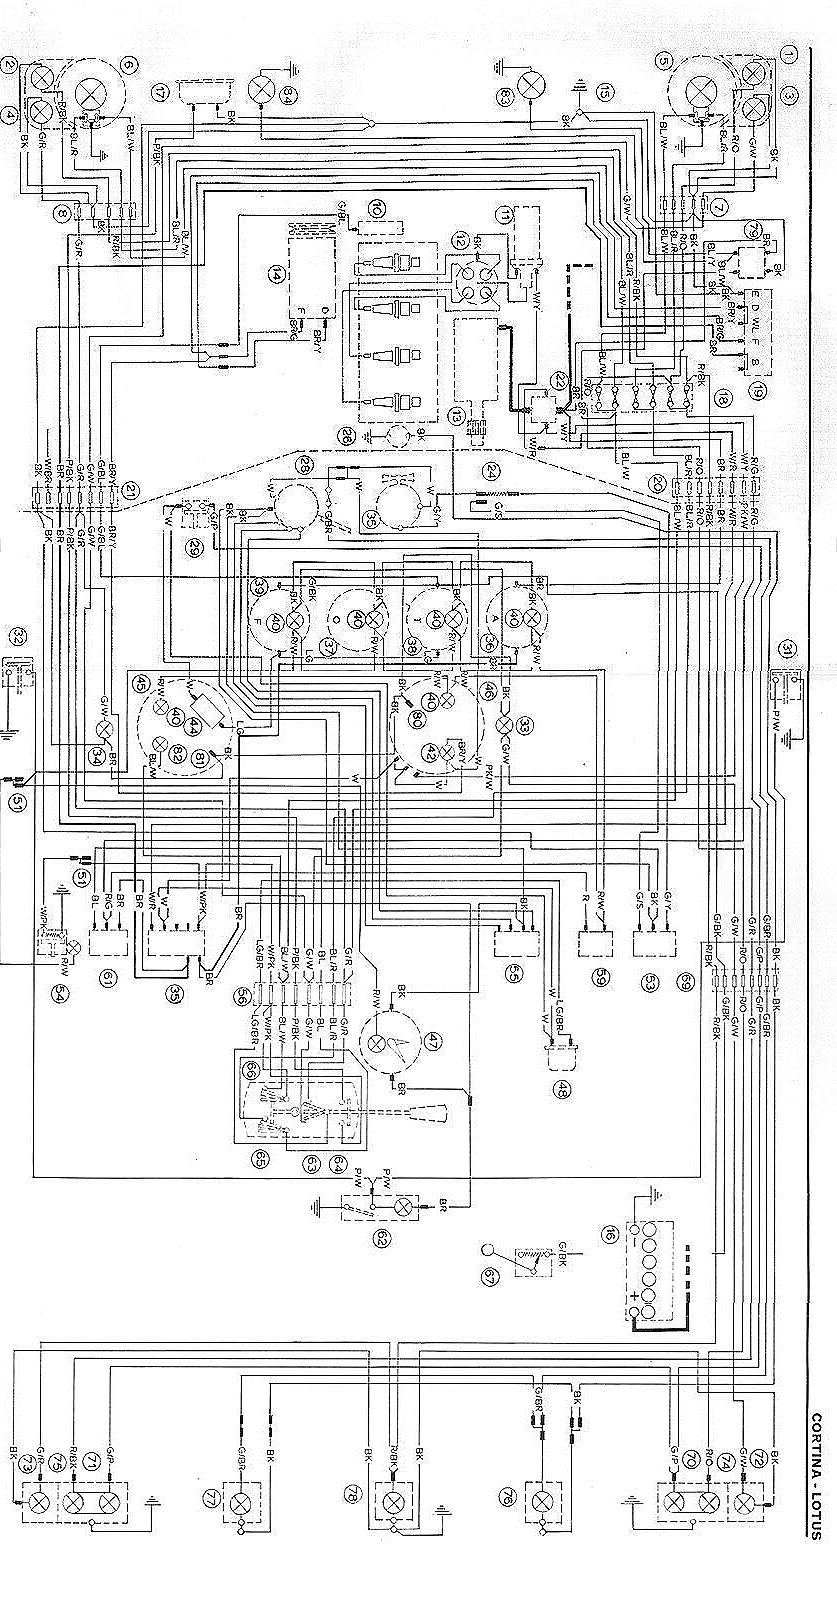 medium resolution of escort power cord wiring diagram mk2 wiring diagram diagrams and ford focus 19m